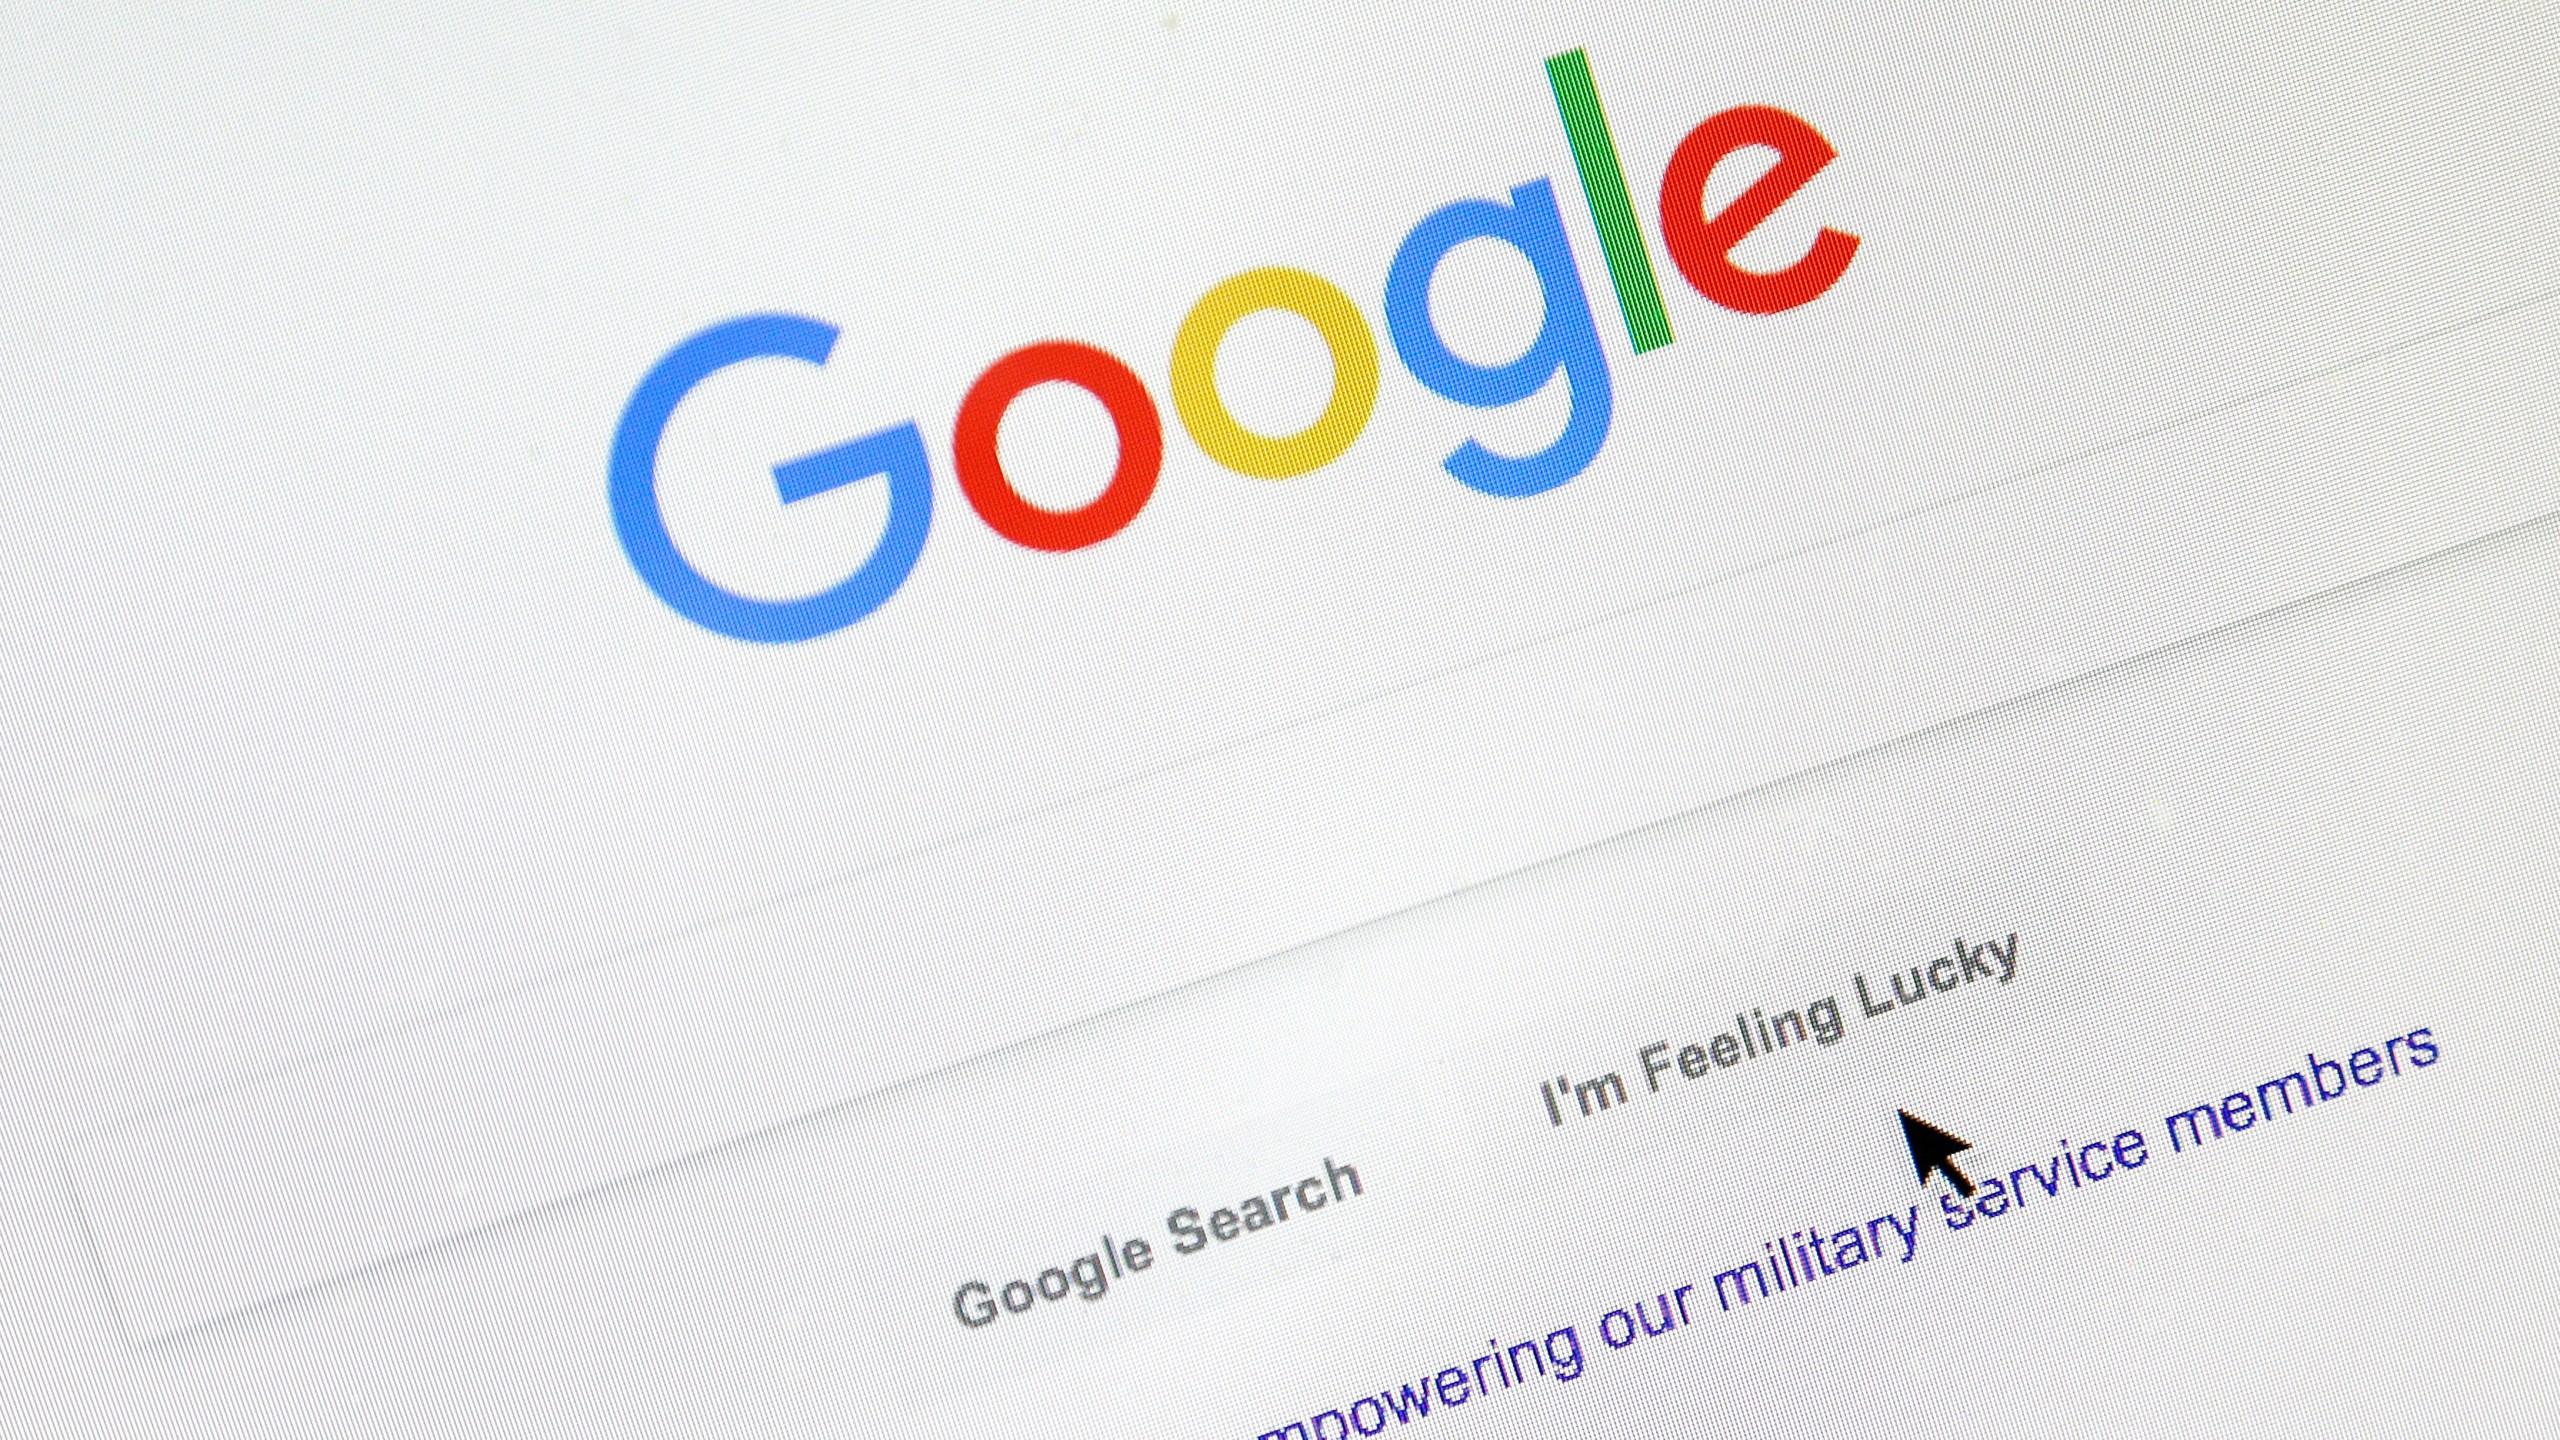 AP_Explains_Google_Search_Results_19350-159532.jpg27287686